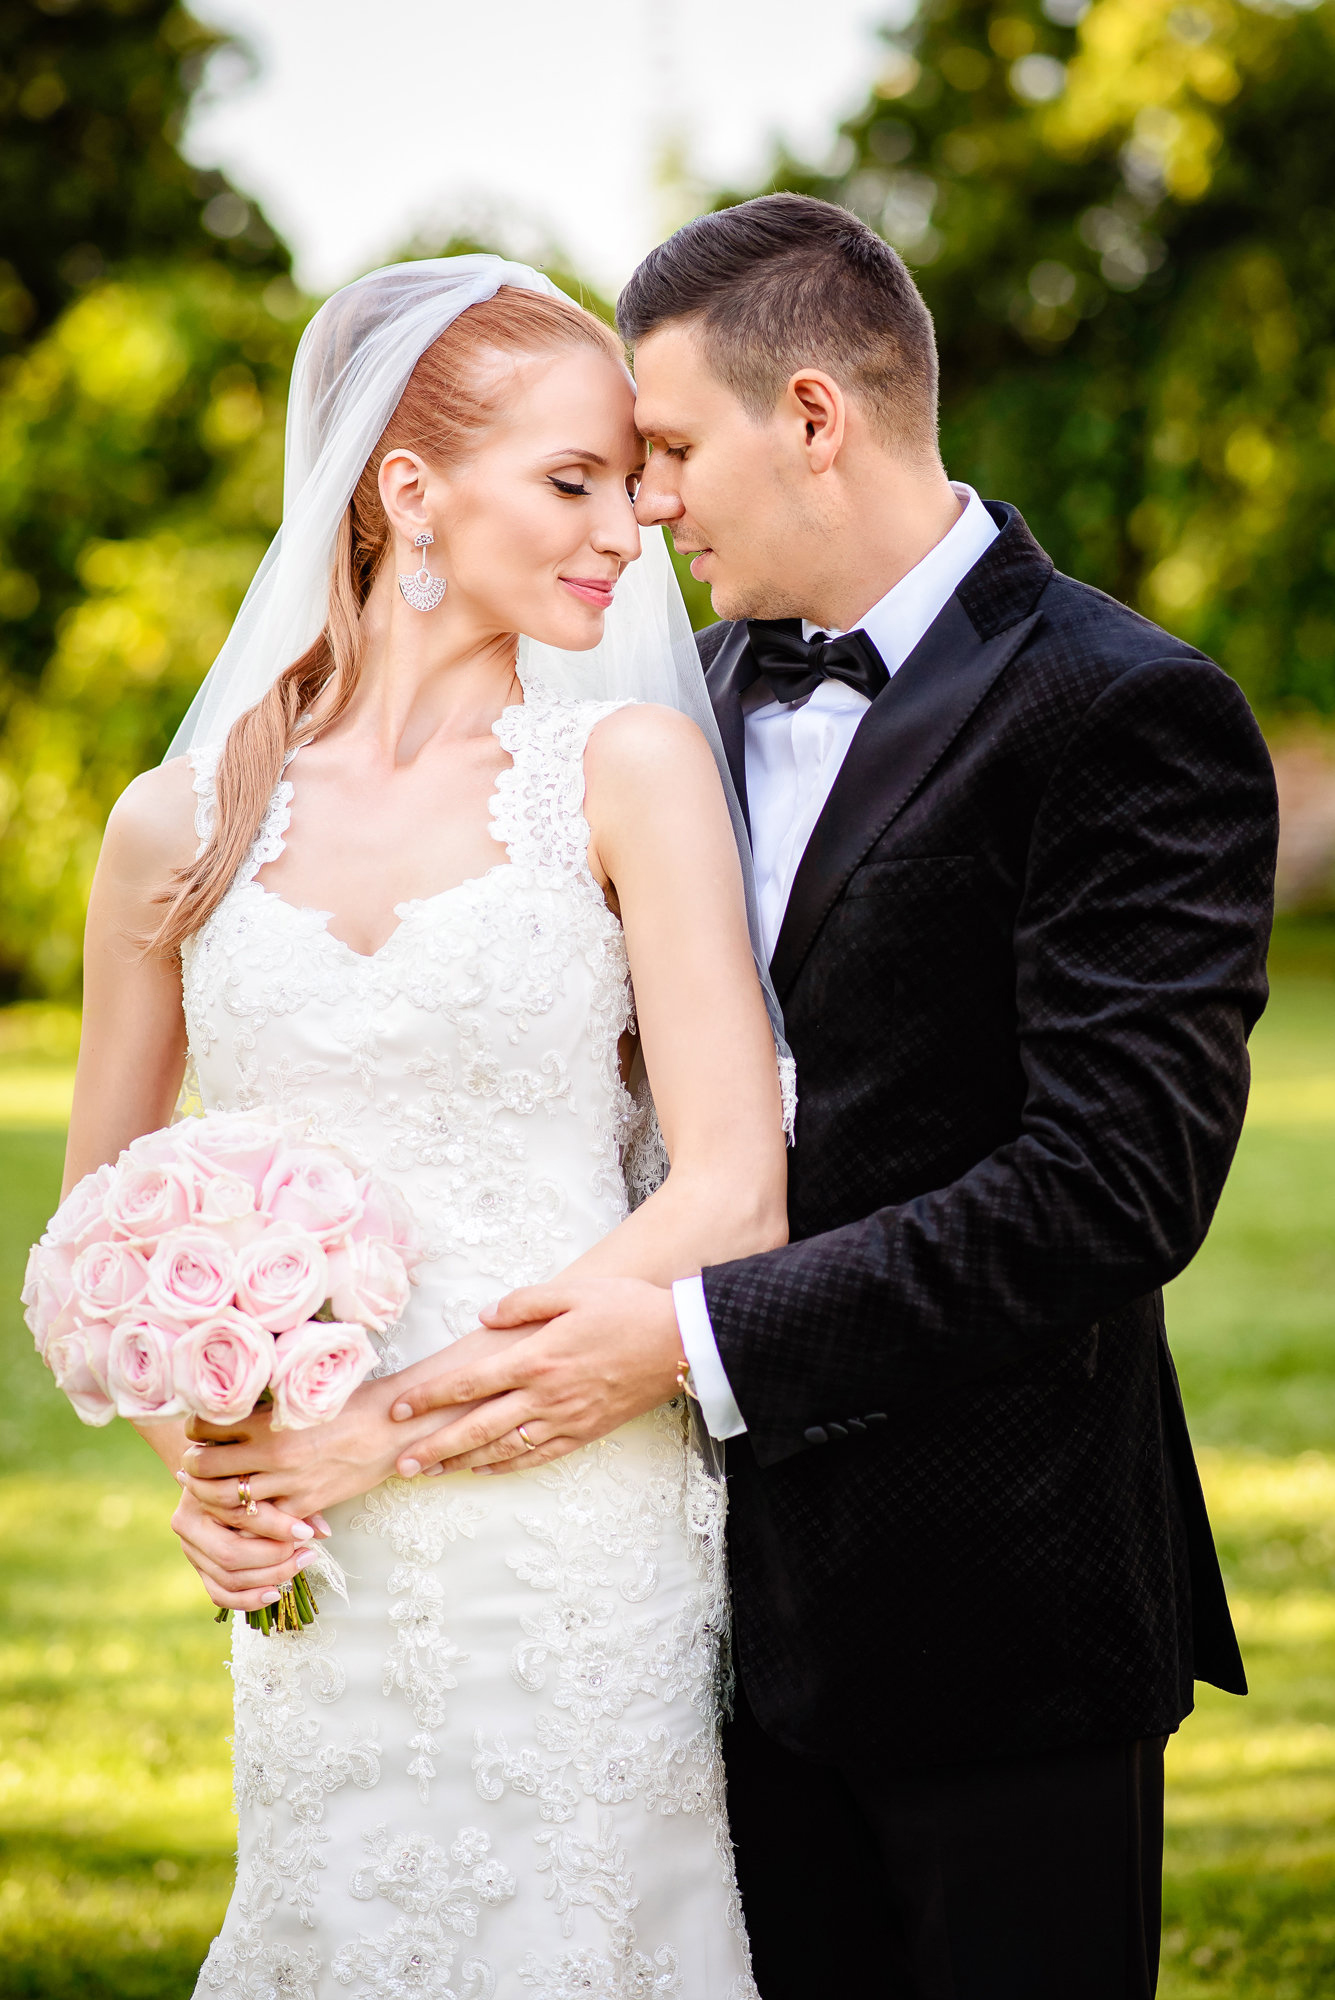 alexandru madalina wedding day 24